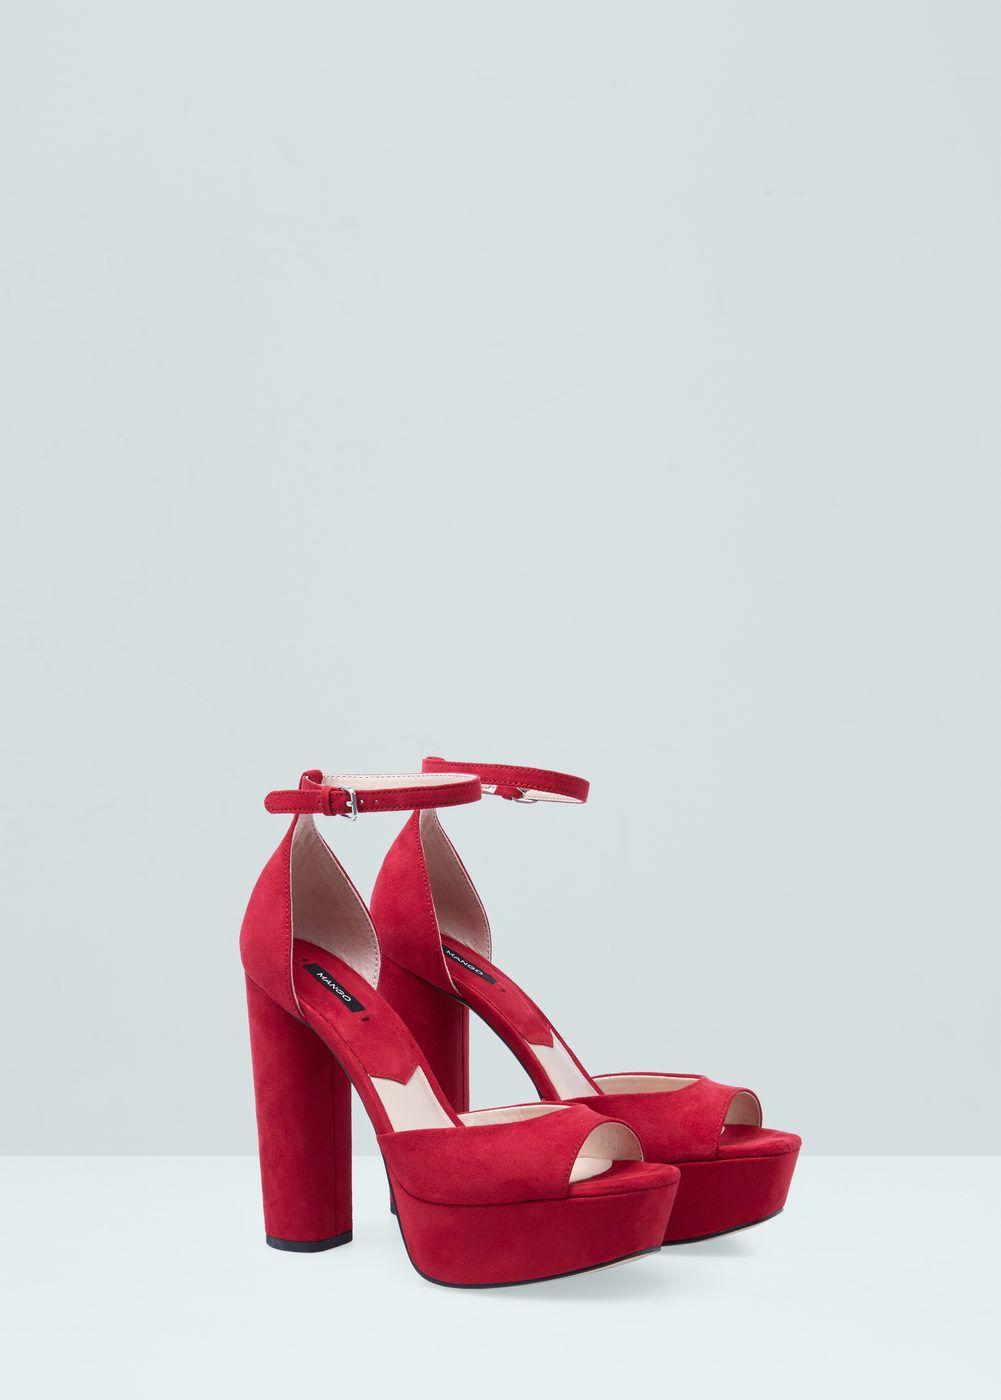 Sandalia pulsera plataforma Mujer | Zapatos mujer, Zapatos